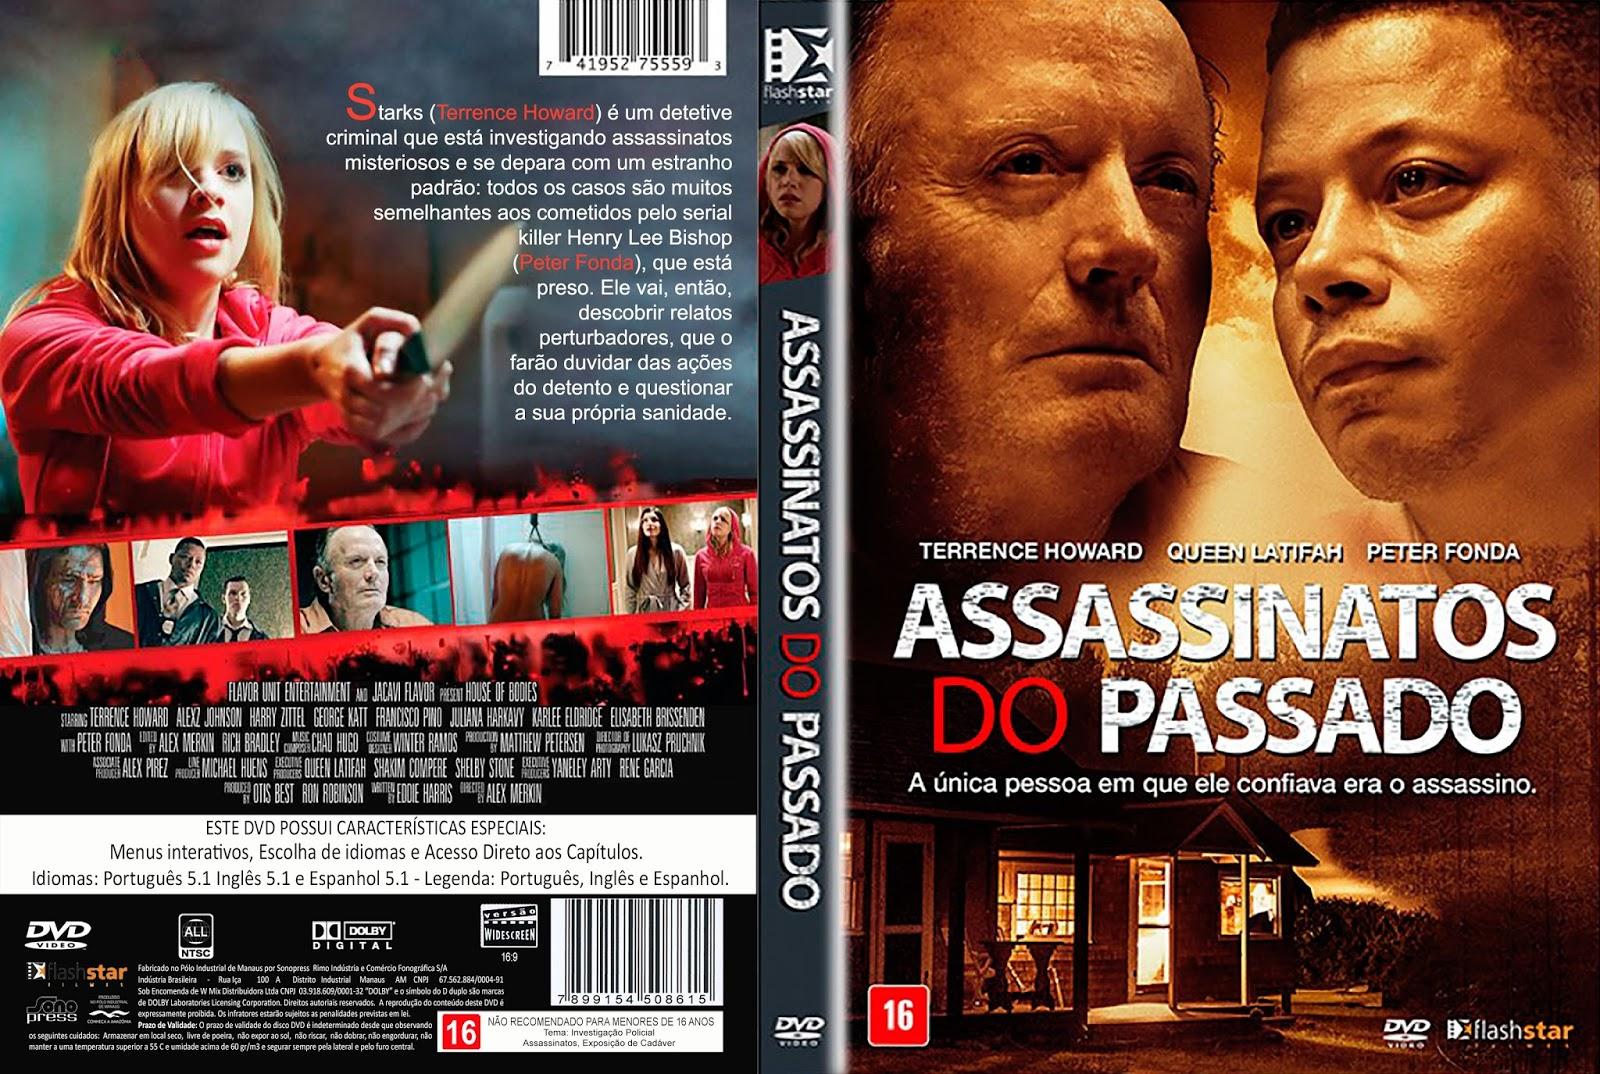 Download Assassinatos do Passado DVD-R Download Assassinatos do Passado DVD-R Assassinatos 2Bdo 2BPassado 2BDVD R 2BXANDAODOWNLOAD